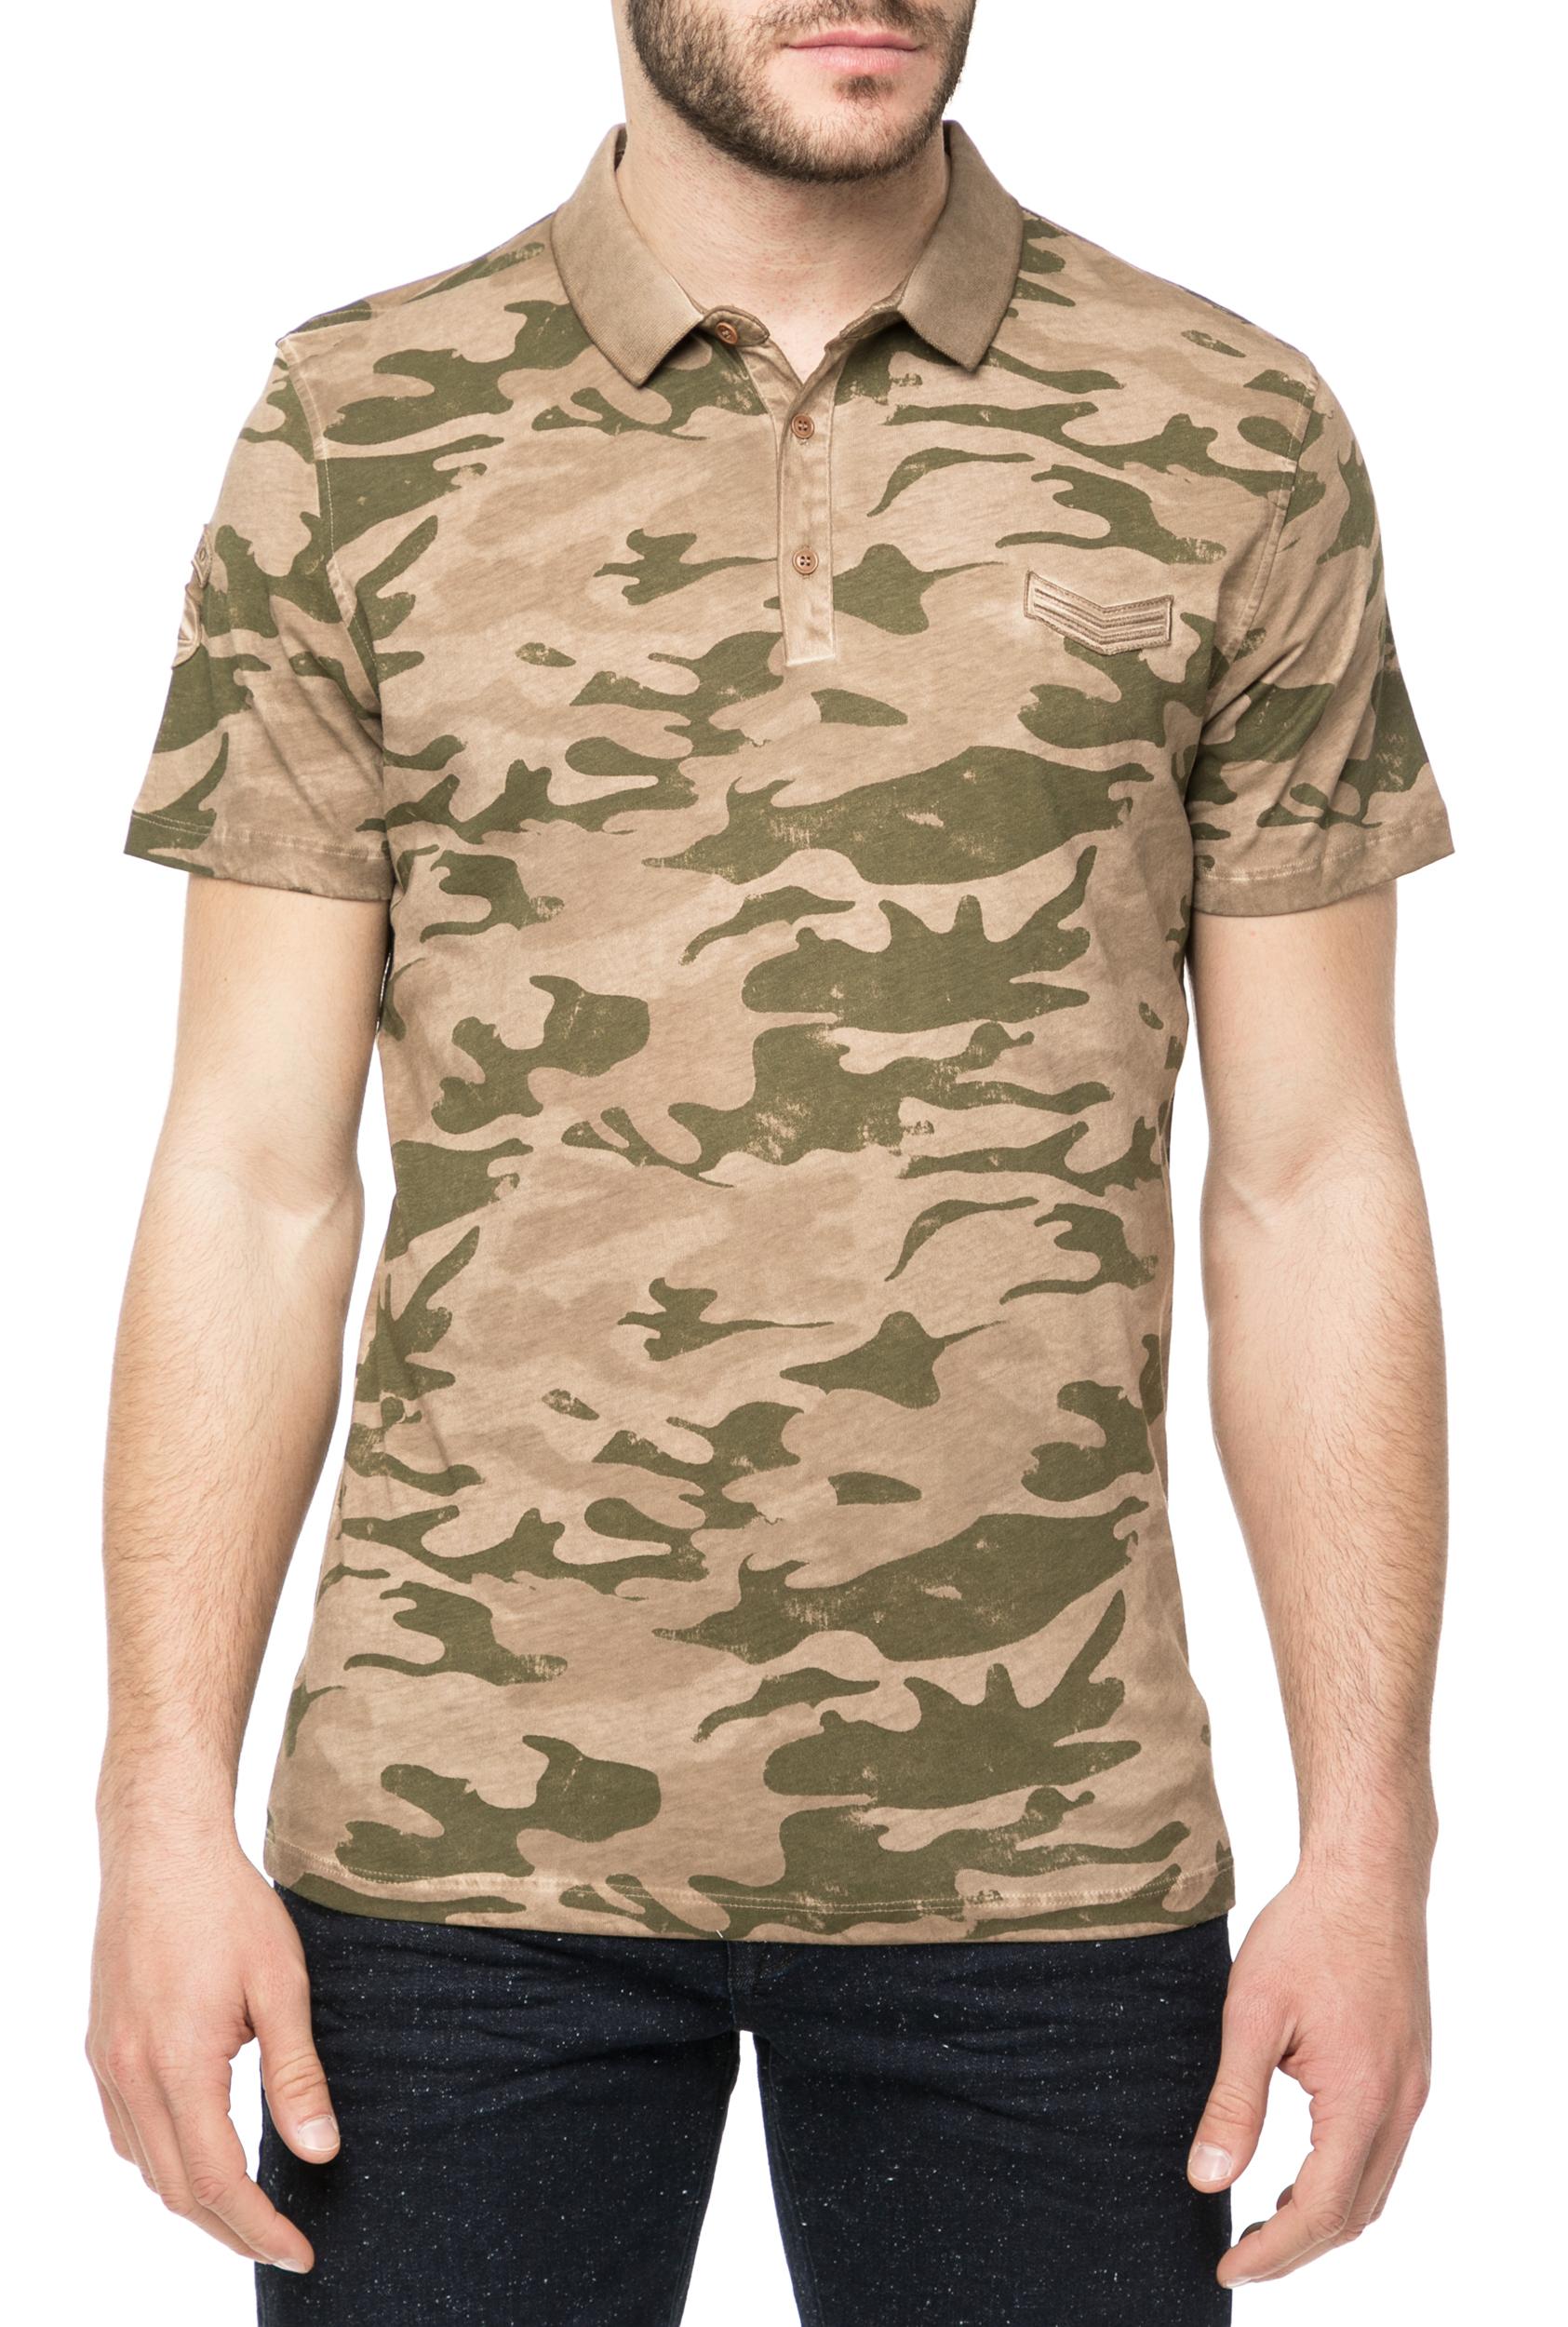 HAMAKI HO - Ανδρική πόλο μπλούζα HAMAKI HO με μοτίβο παραλλαγής